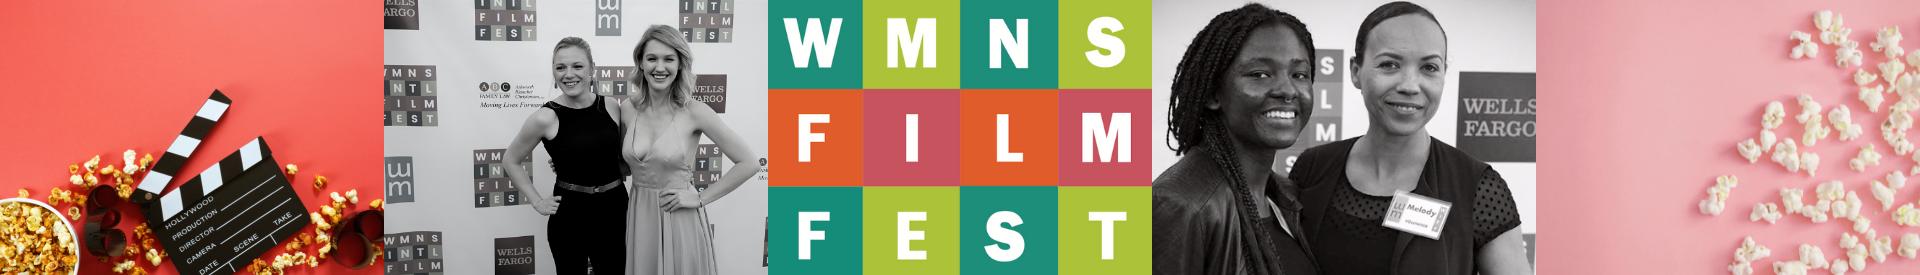 Women's Film Festival San Diego